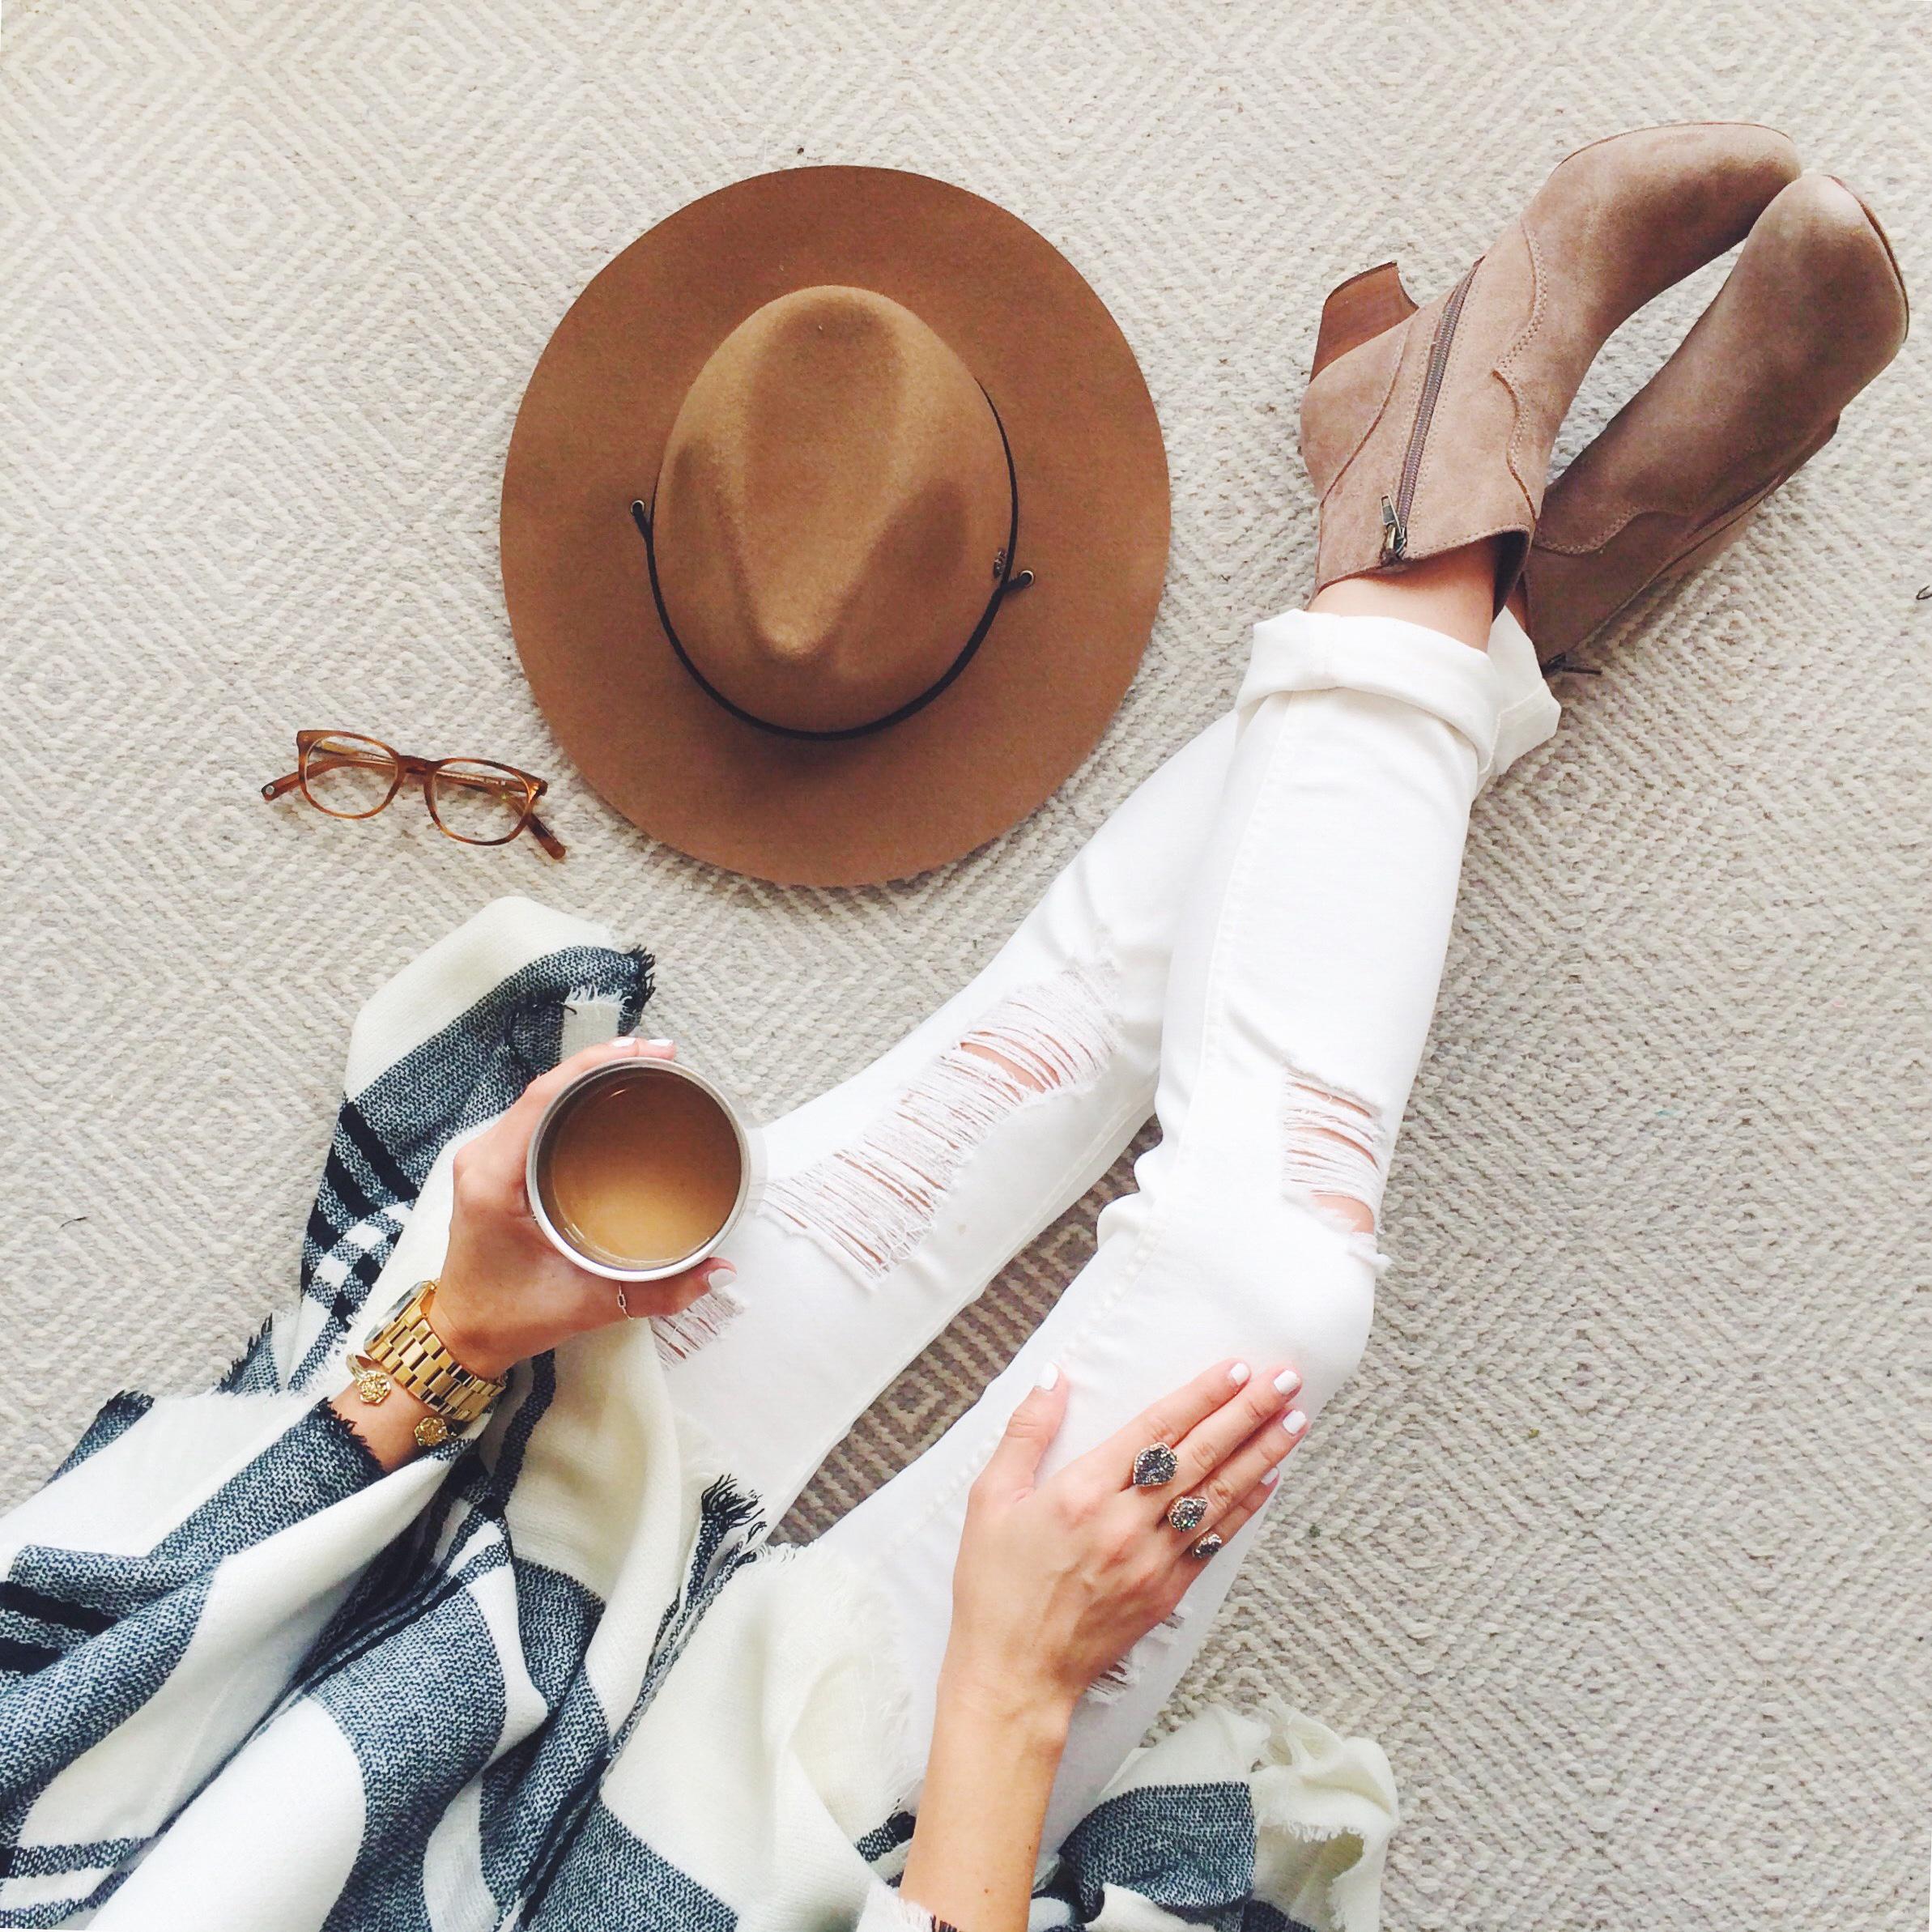 livvyland-coffeenclothes-bobble-presse-white-jeans-plaid-poncho-atx-austin-fashion-blogger-olivia-watson